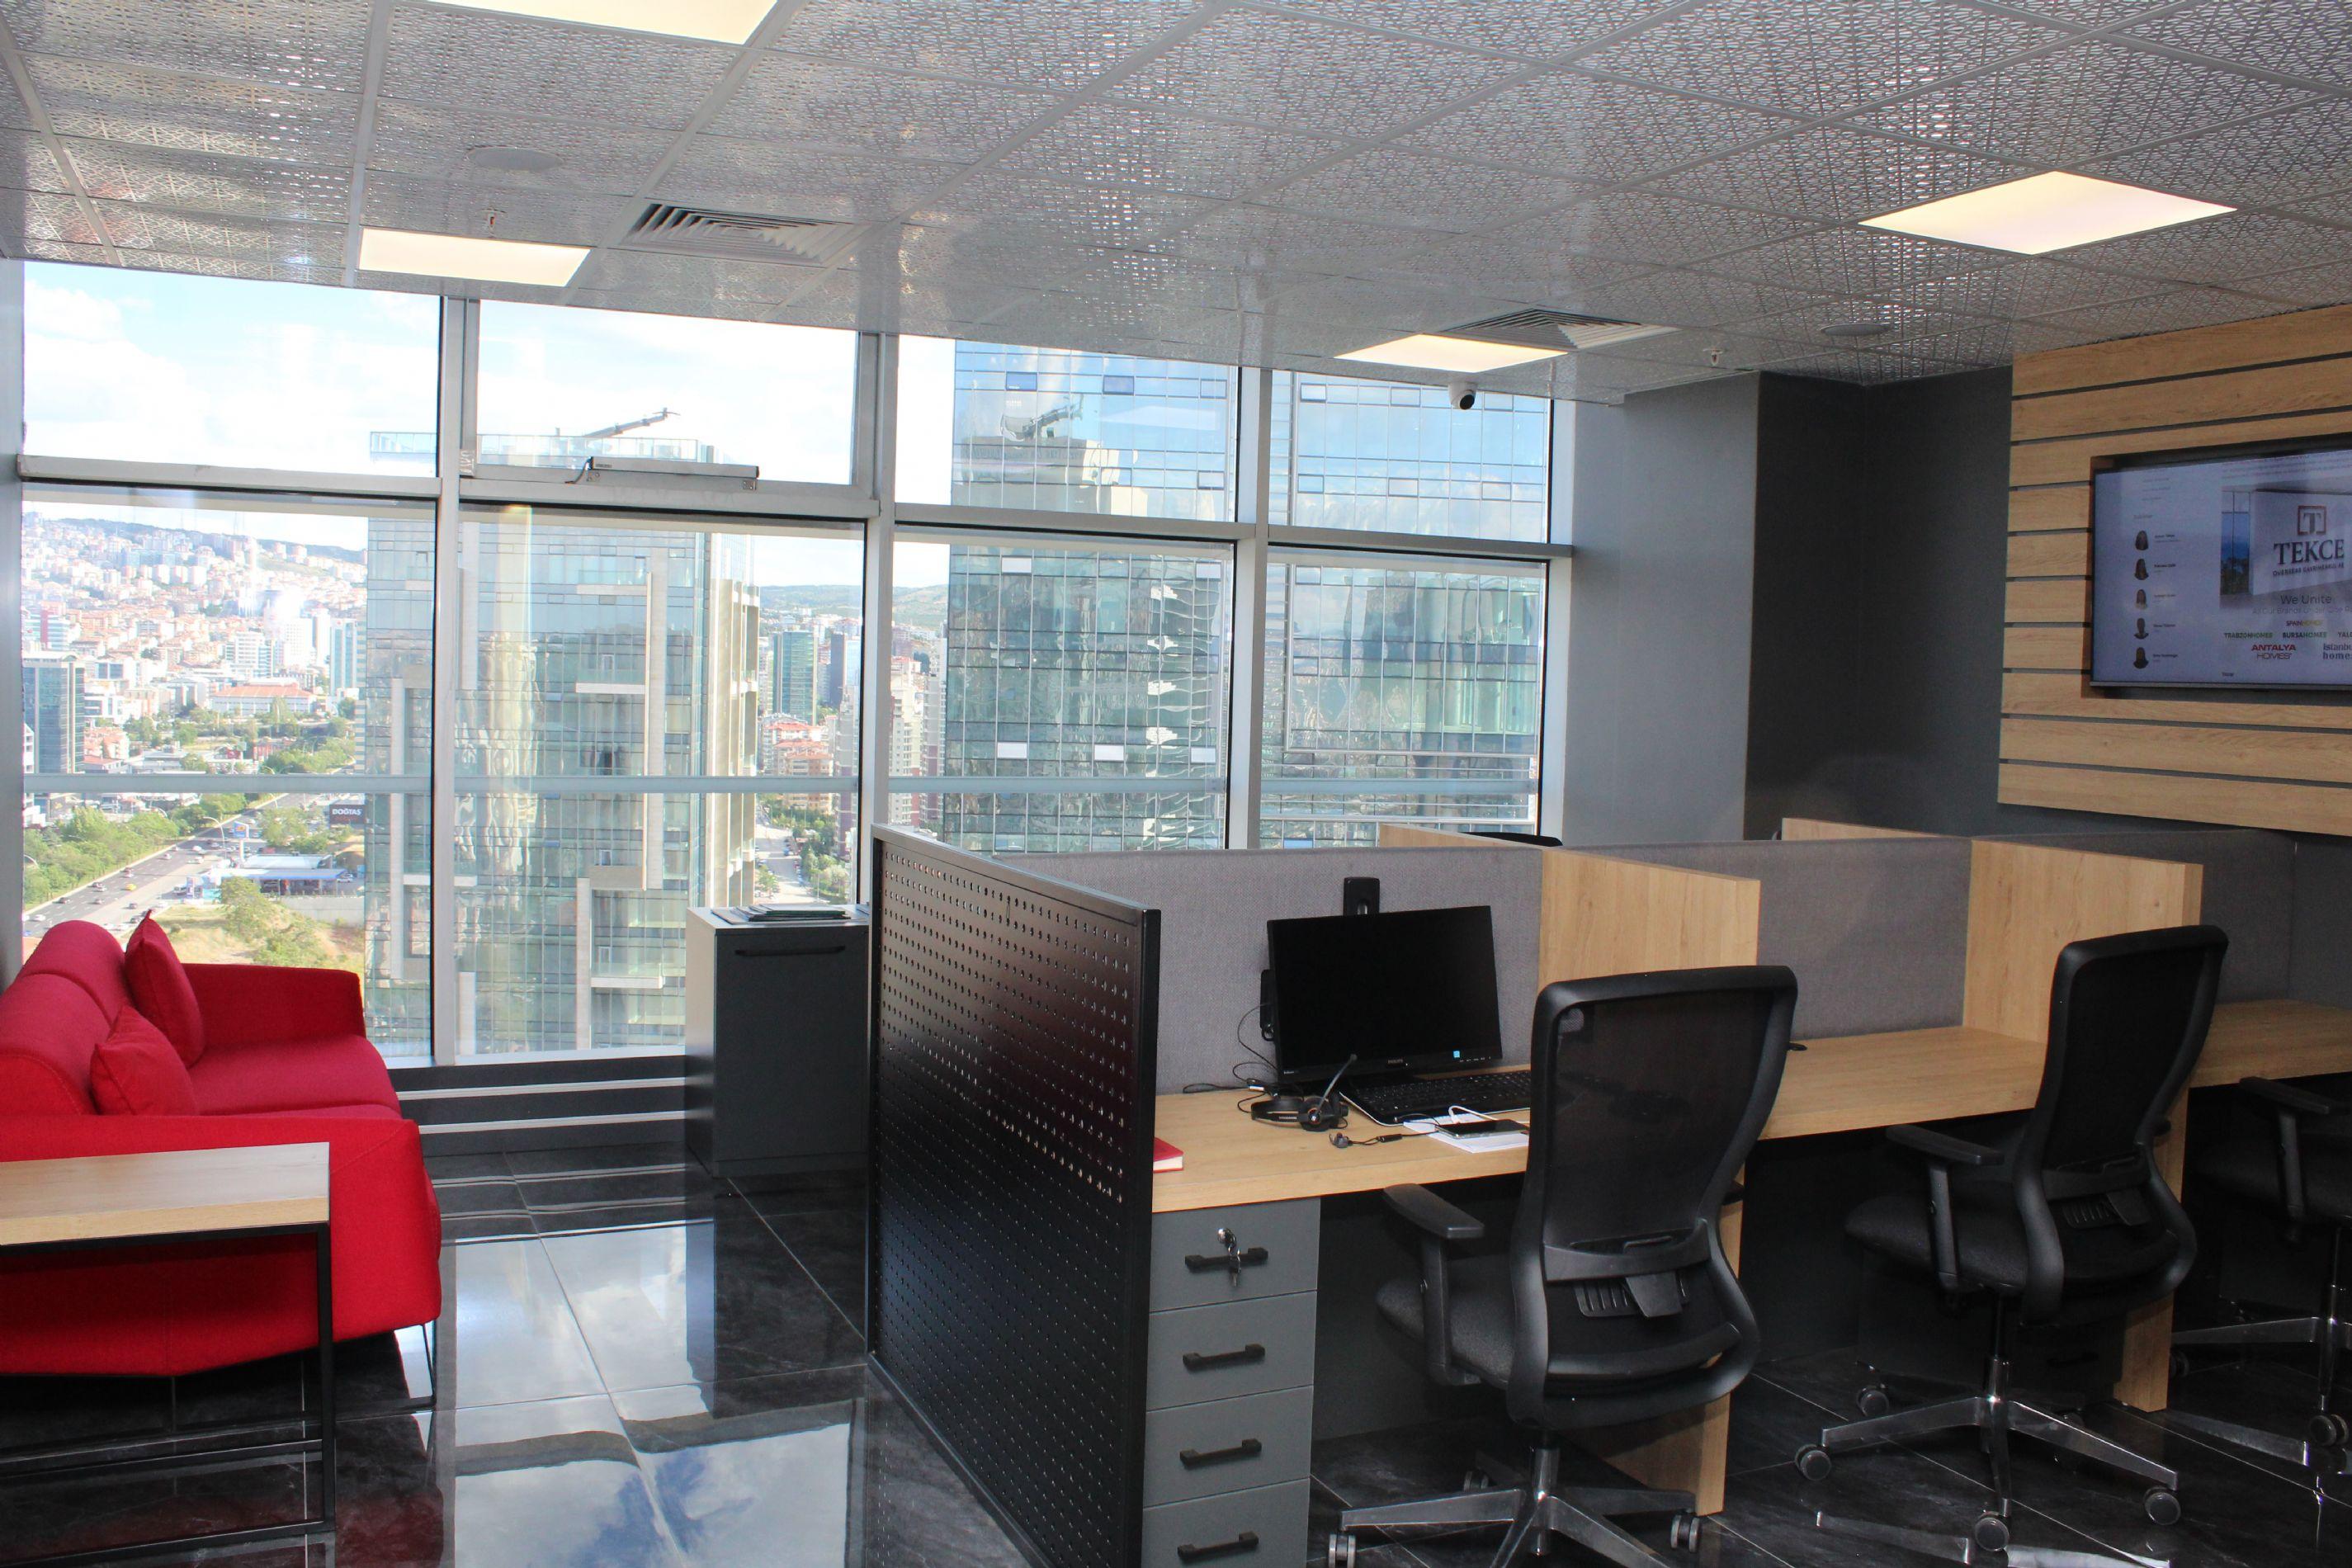 Офис Tekce Overseas Real Estate Inc. в Анкаре